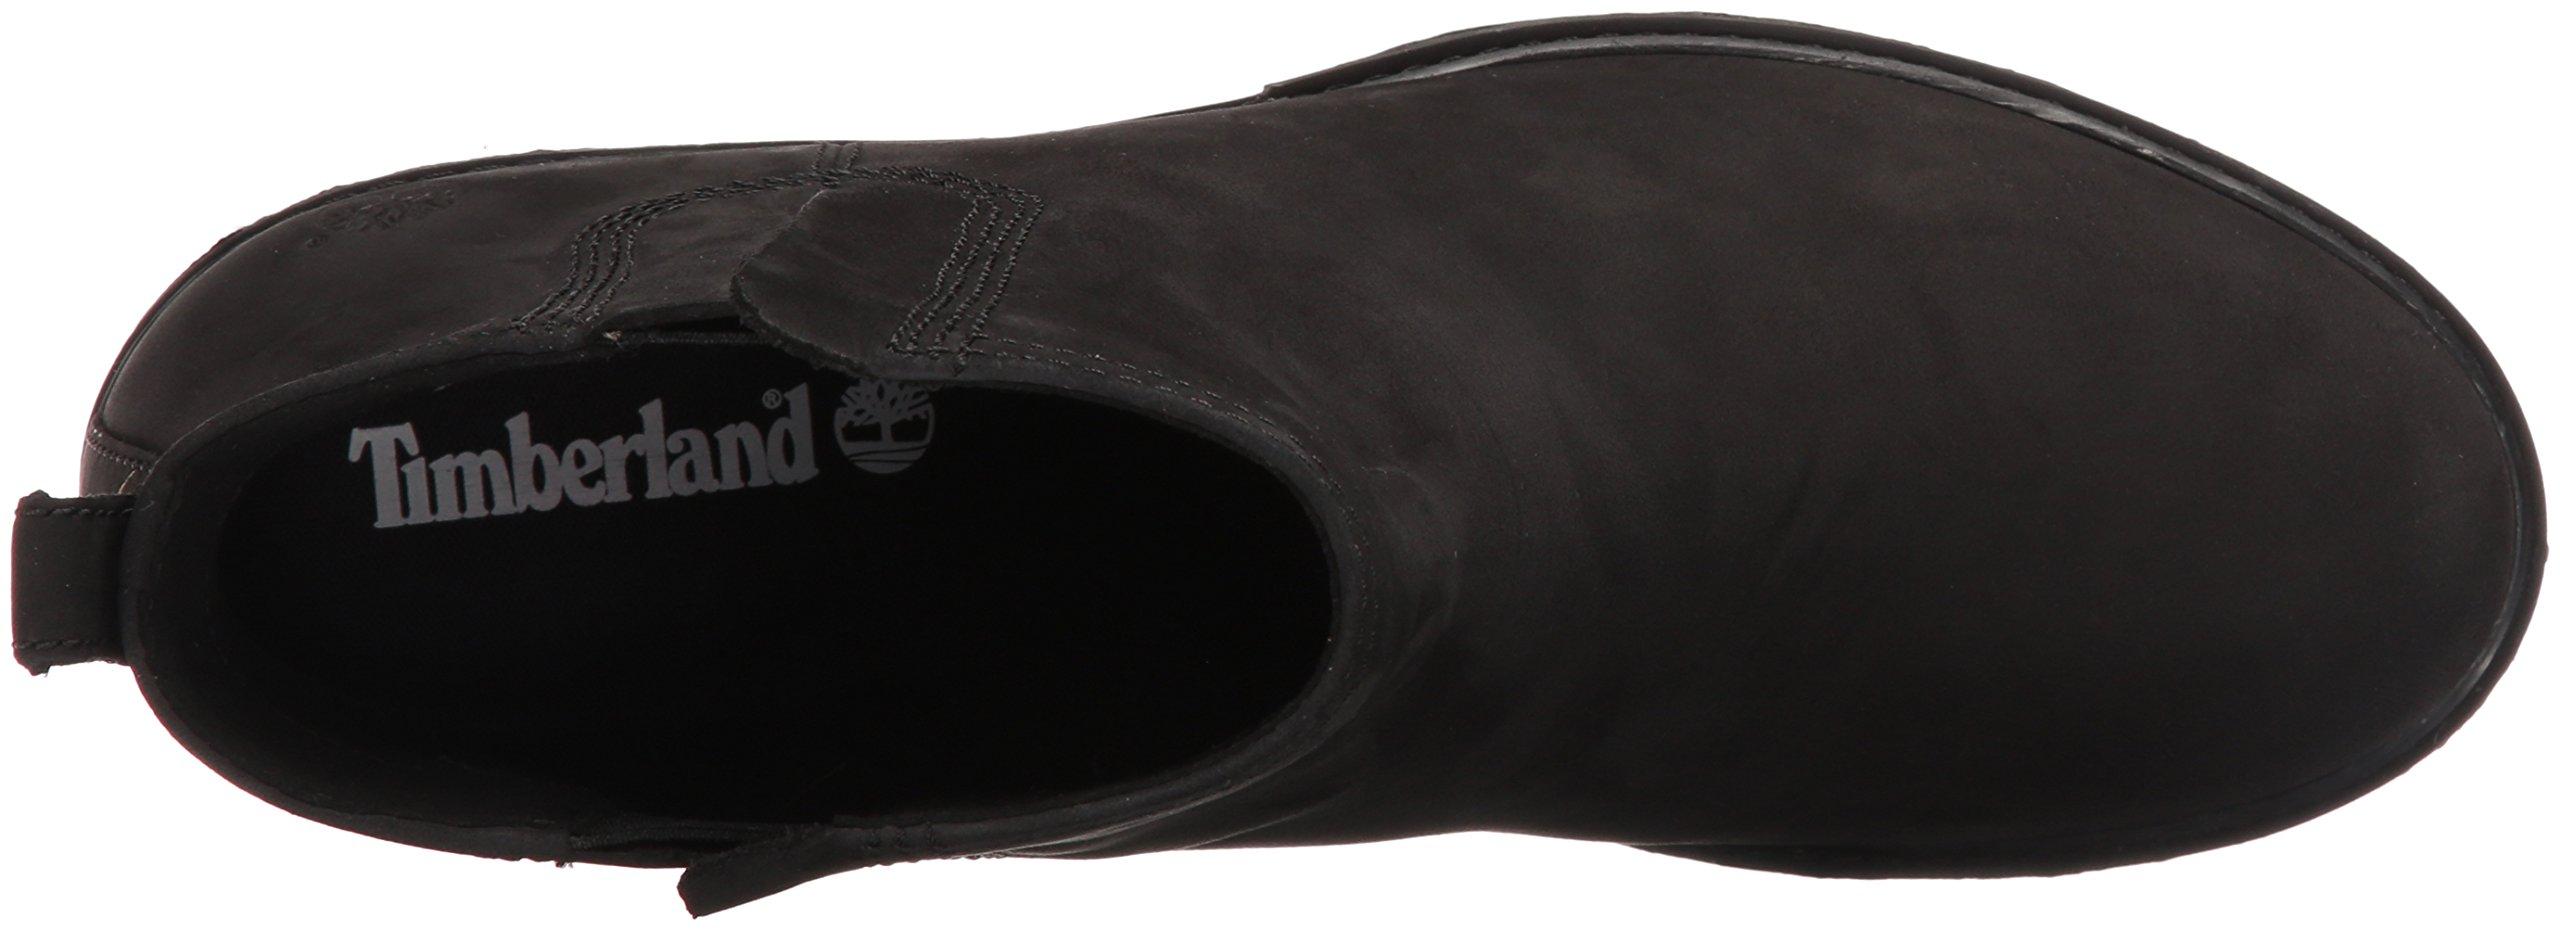 Timberland Women's Amston Chelsea Boot,Black Nubuck,9 M US by Timberland (Image #8)